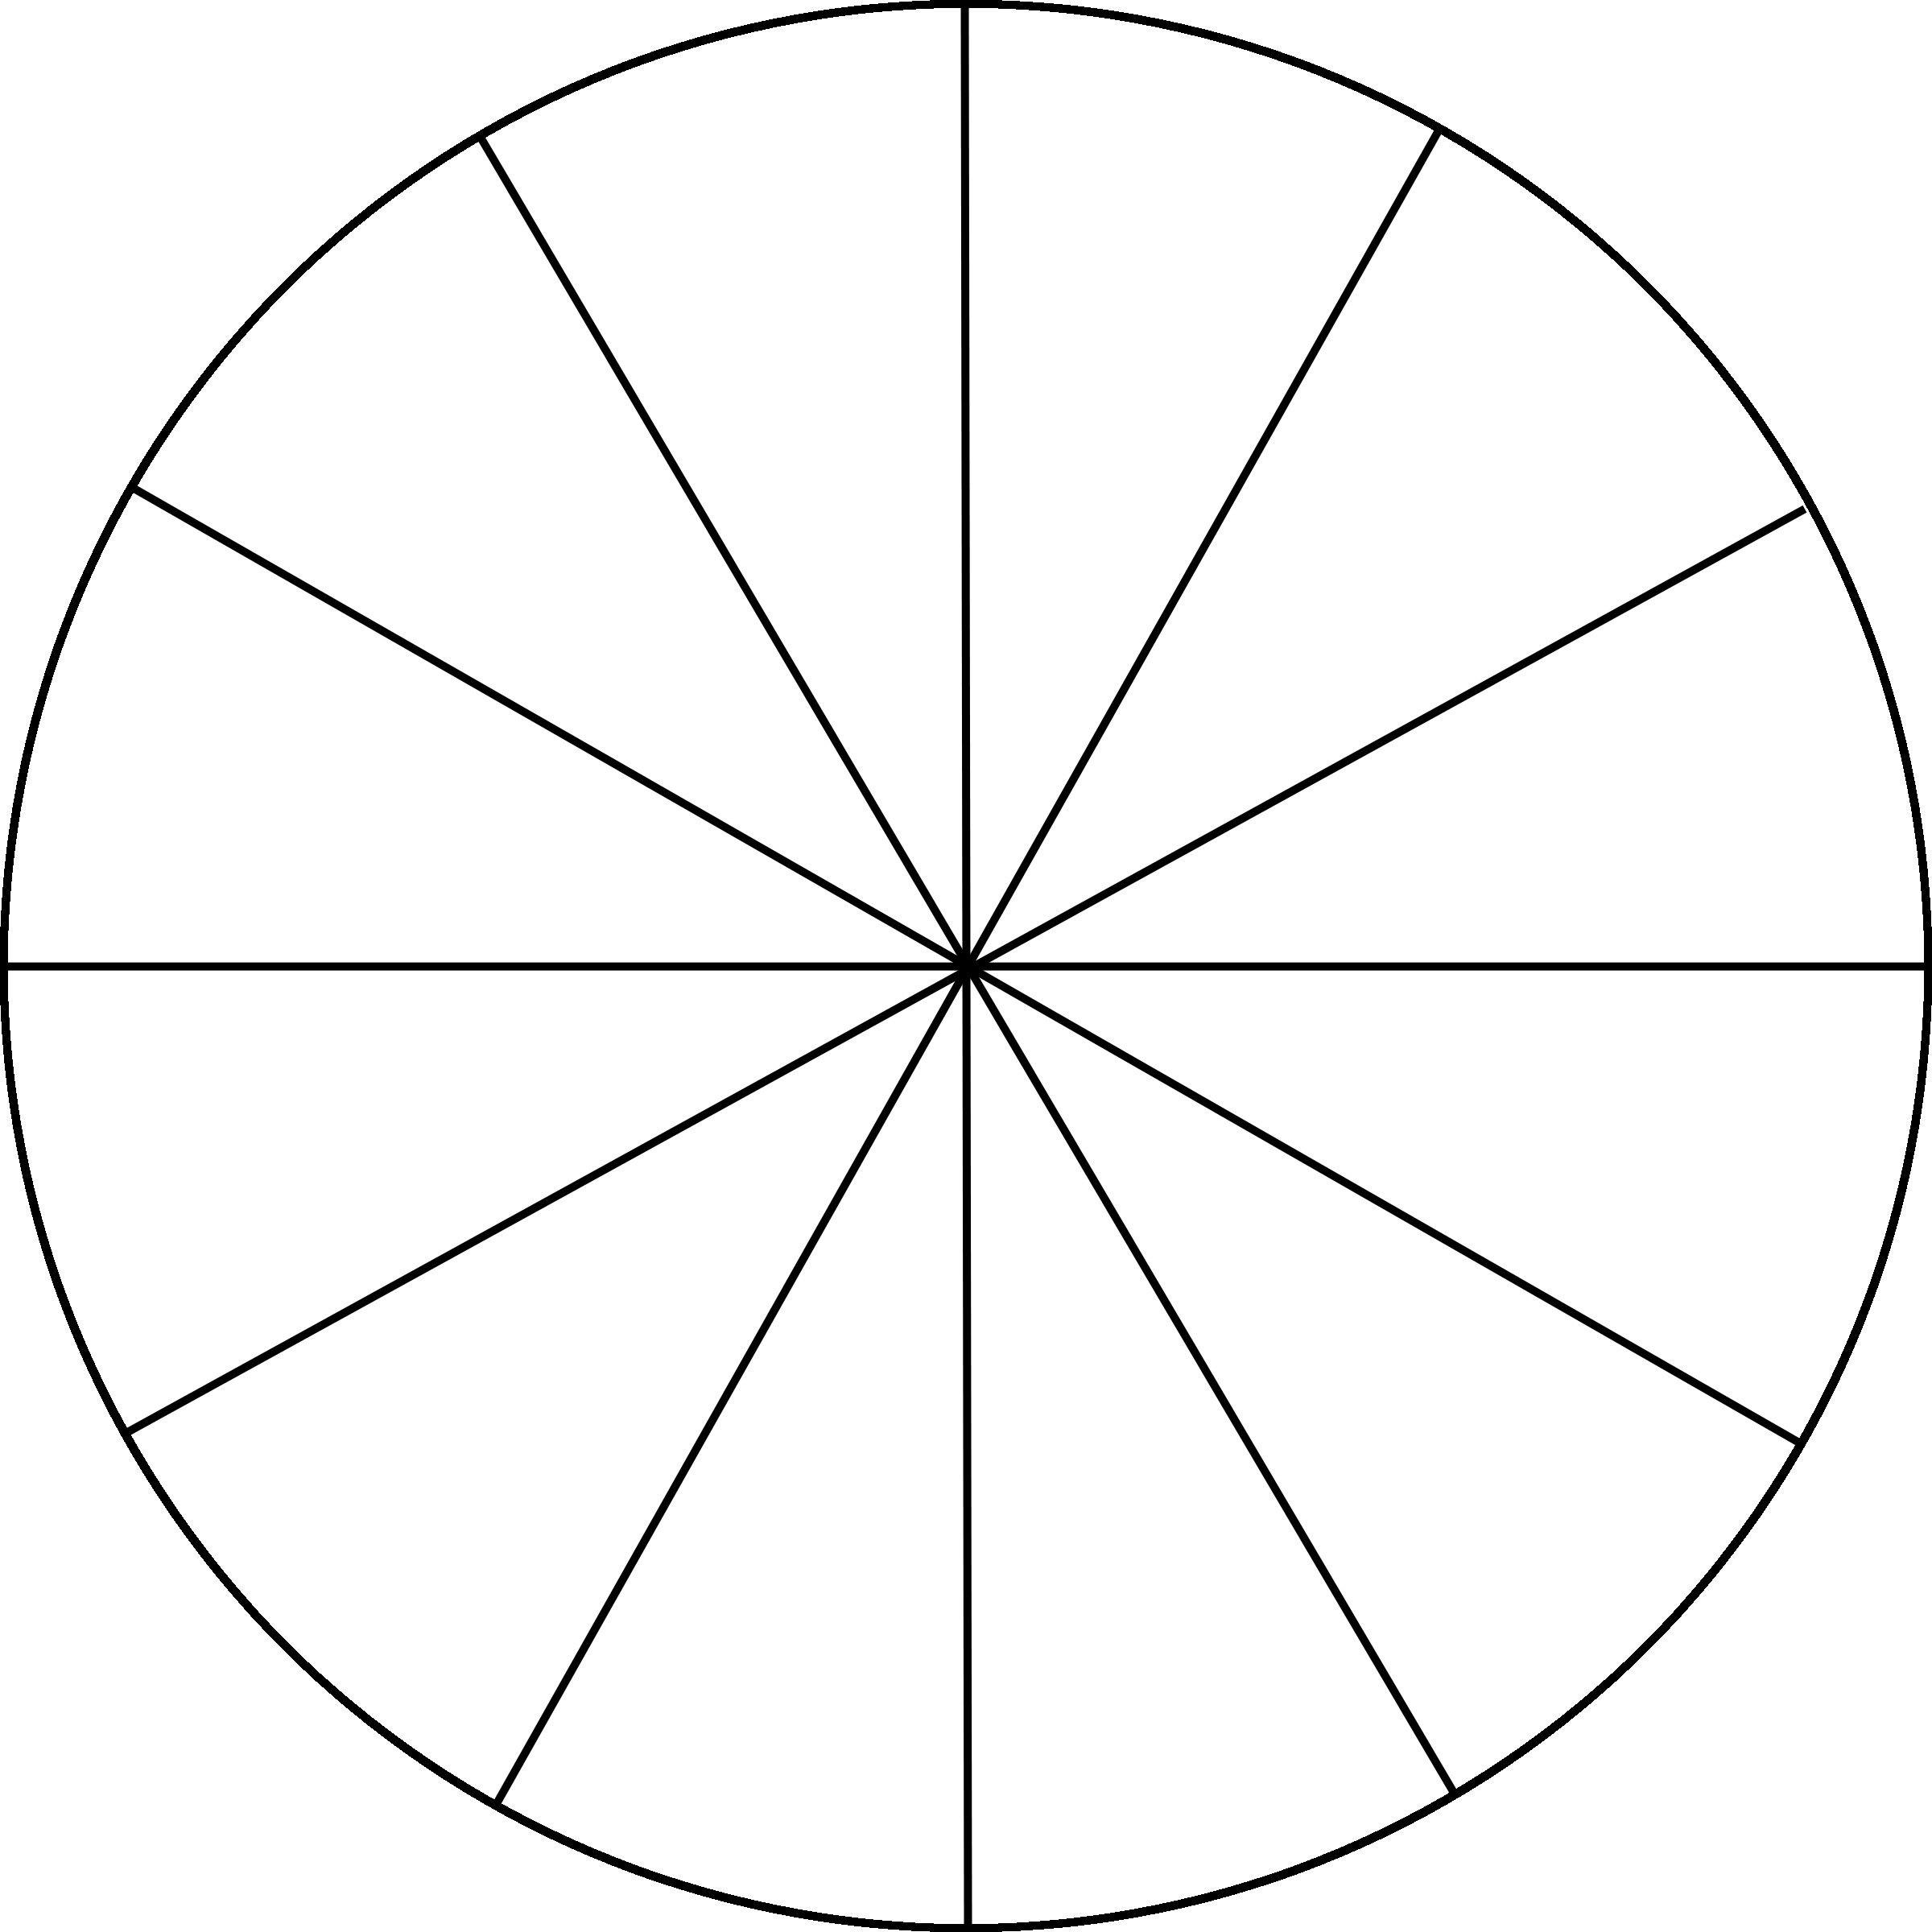 Color Wheel Template  Google Search  Color Camp  Color Wheel Within Blank Color Wheel Template